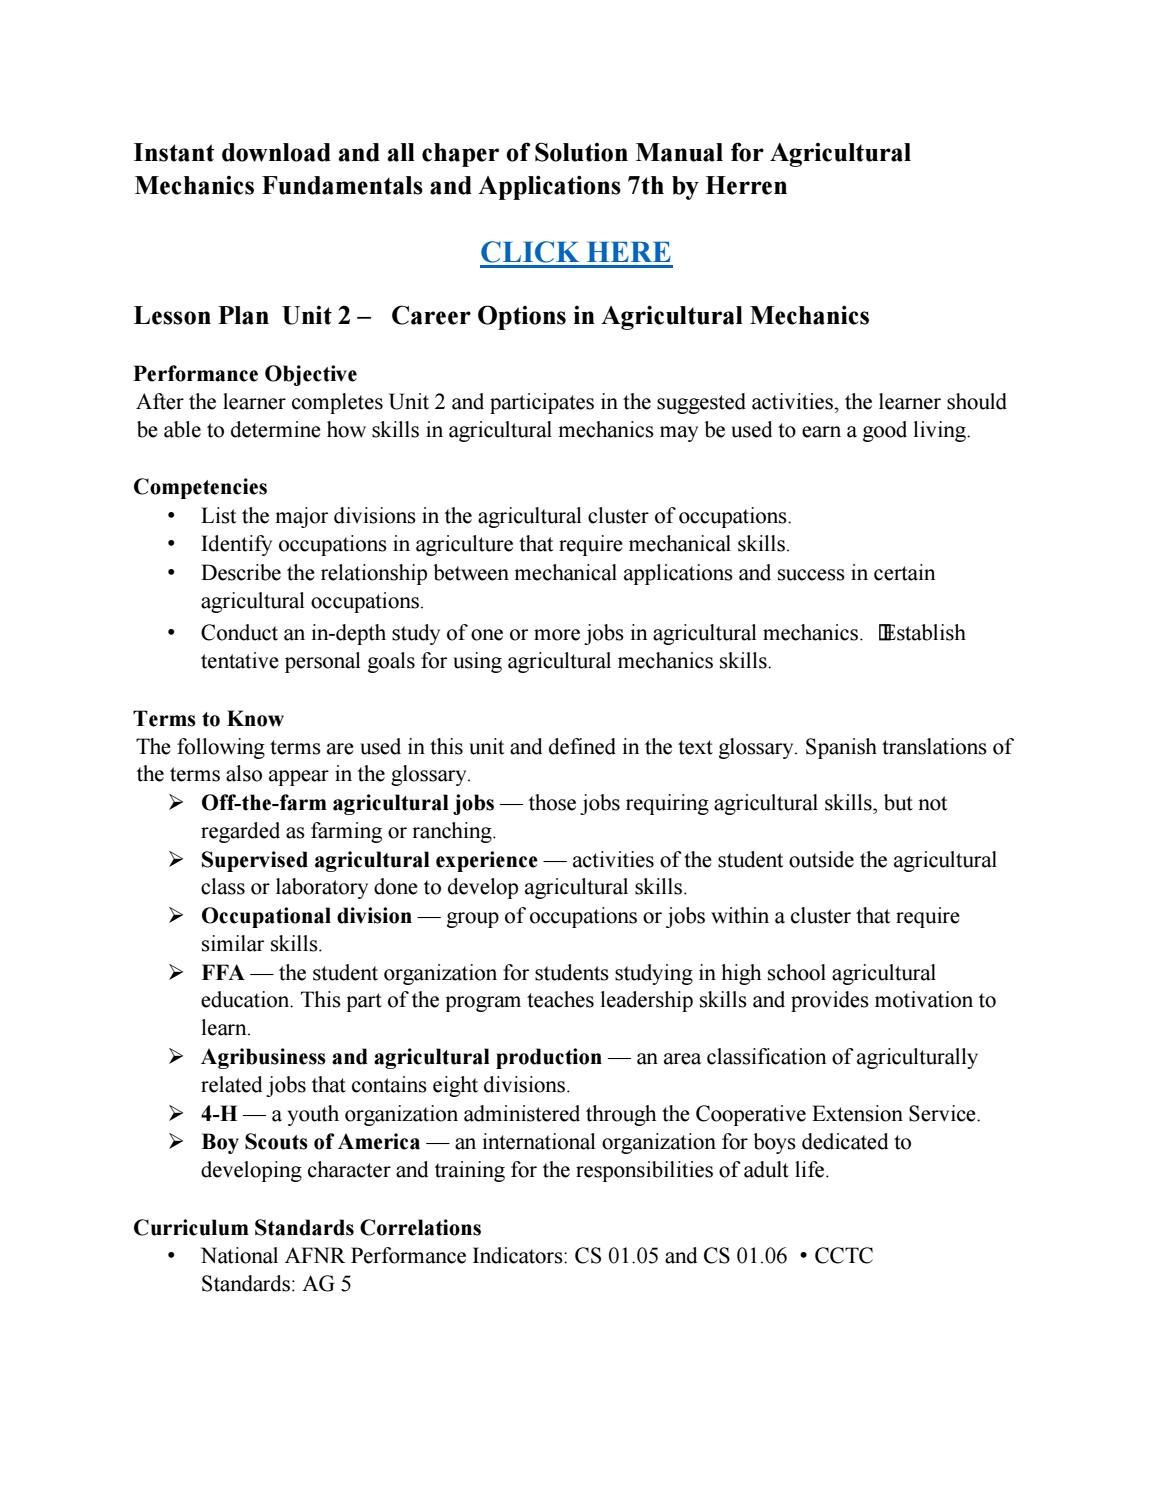 ... Array - download solution manual for agricultural mechanics  fundamentals and rh pinterest com